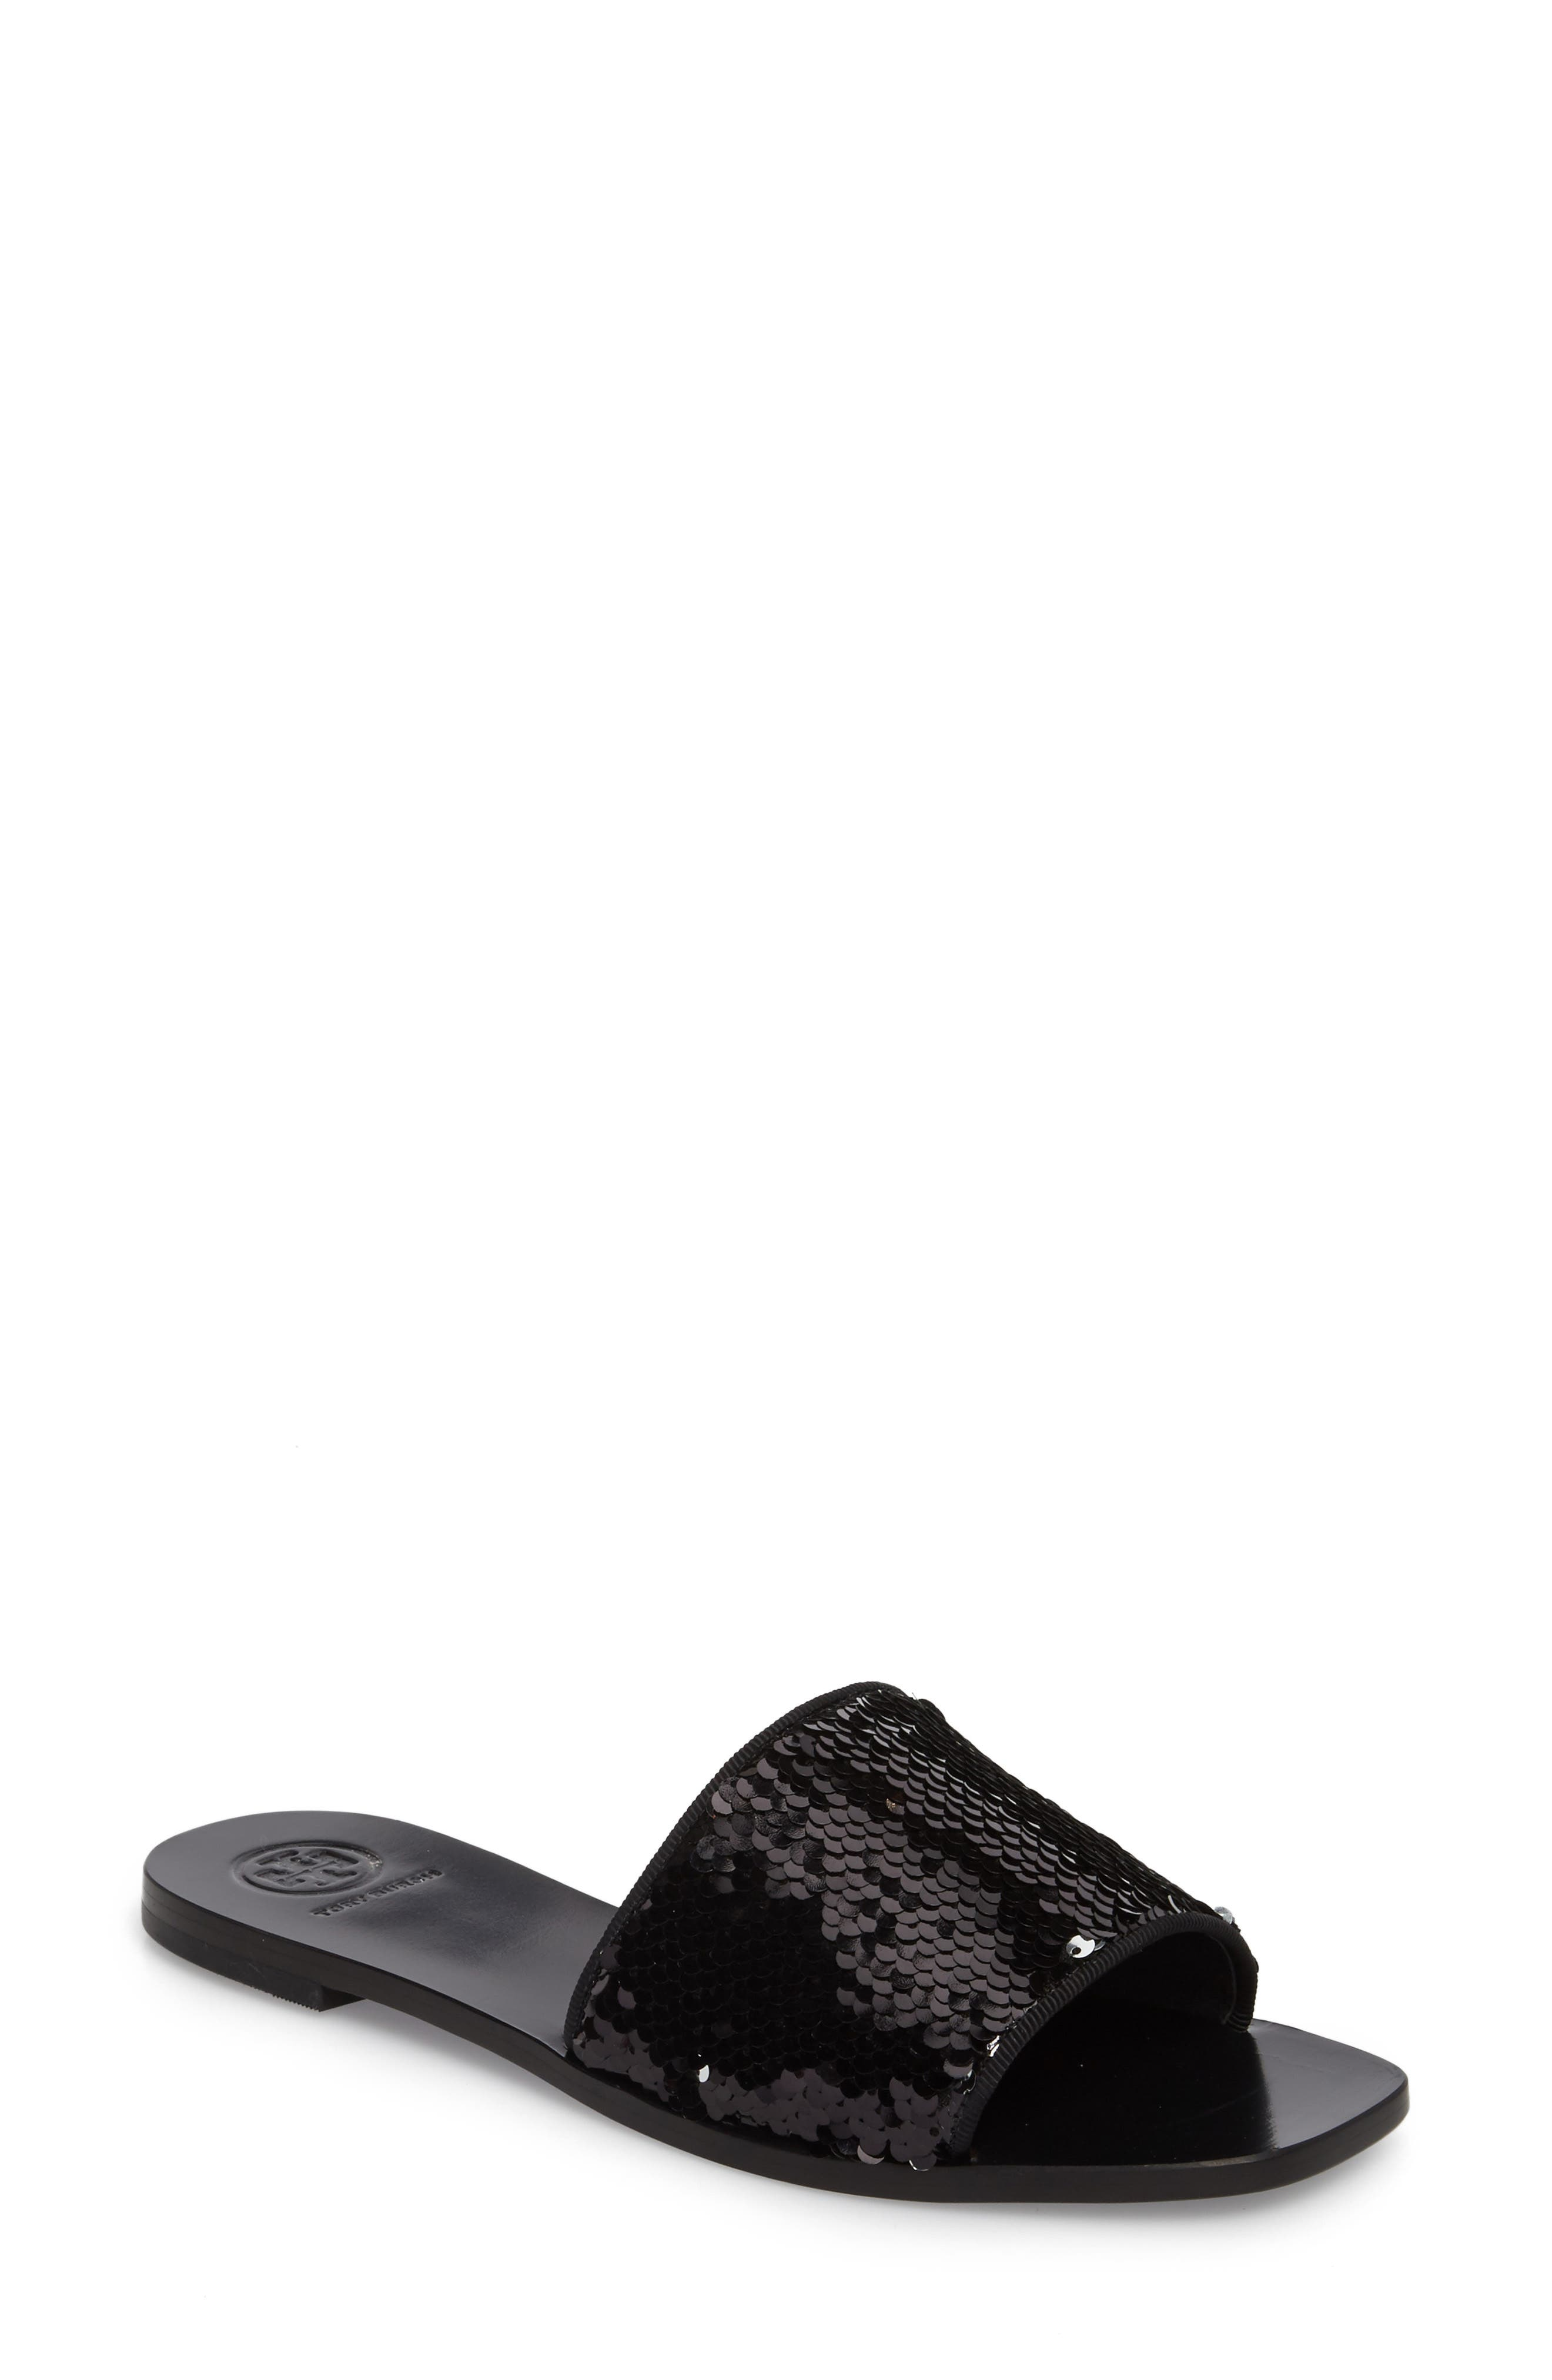 Carter Sequin Slide Sandal,                             Main thumbnail 1, color,                             043